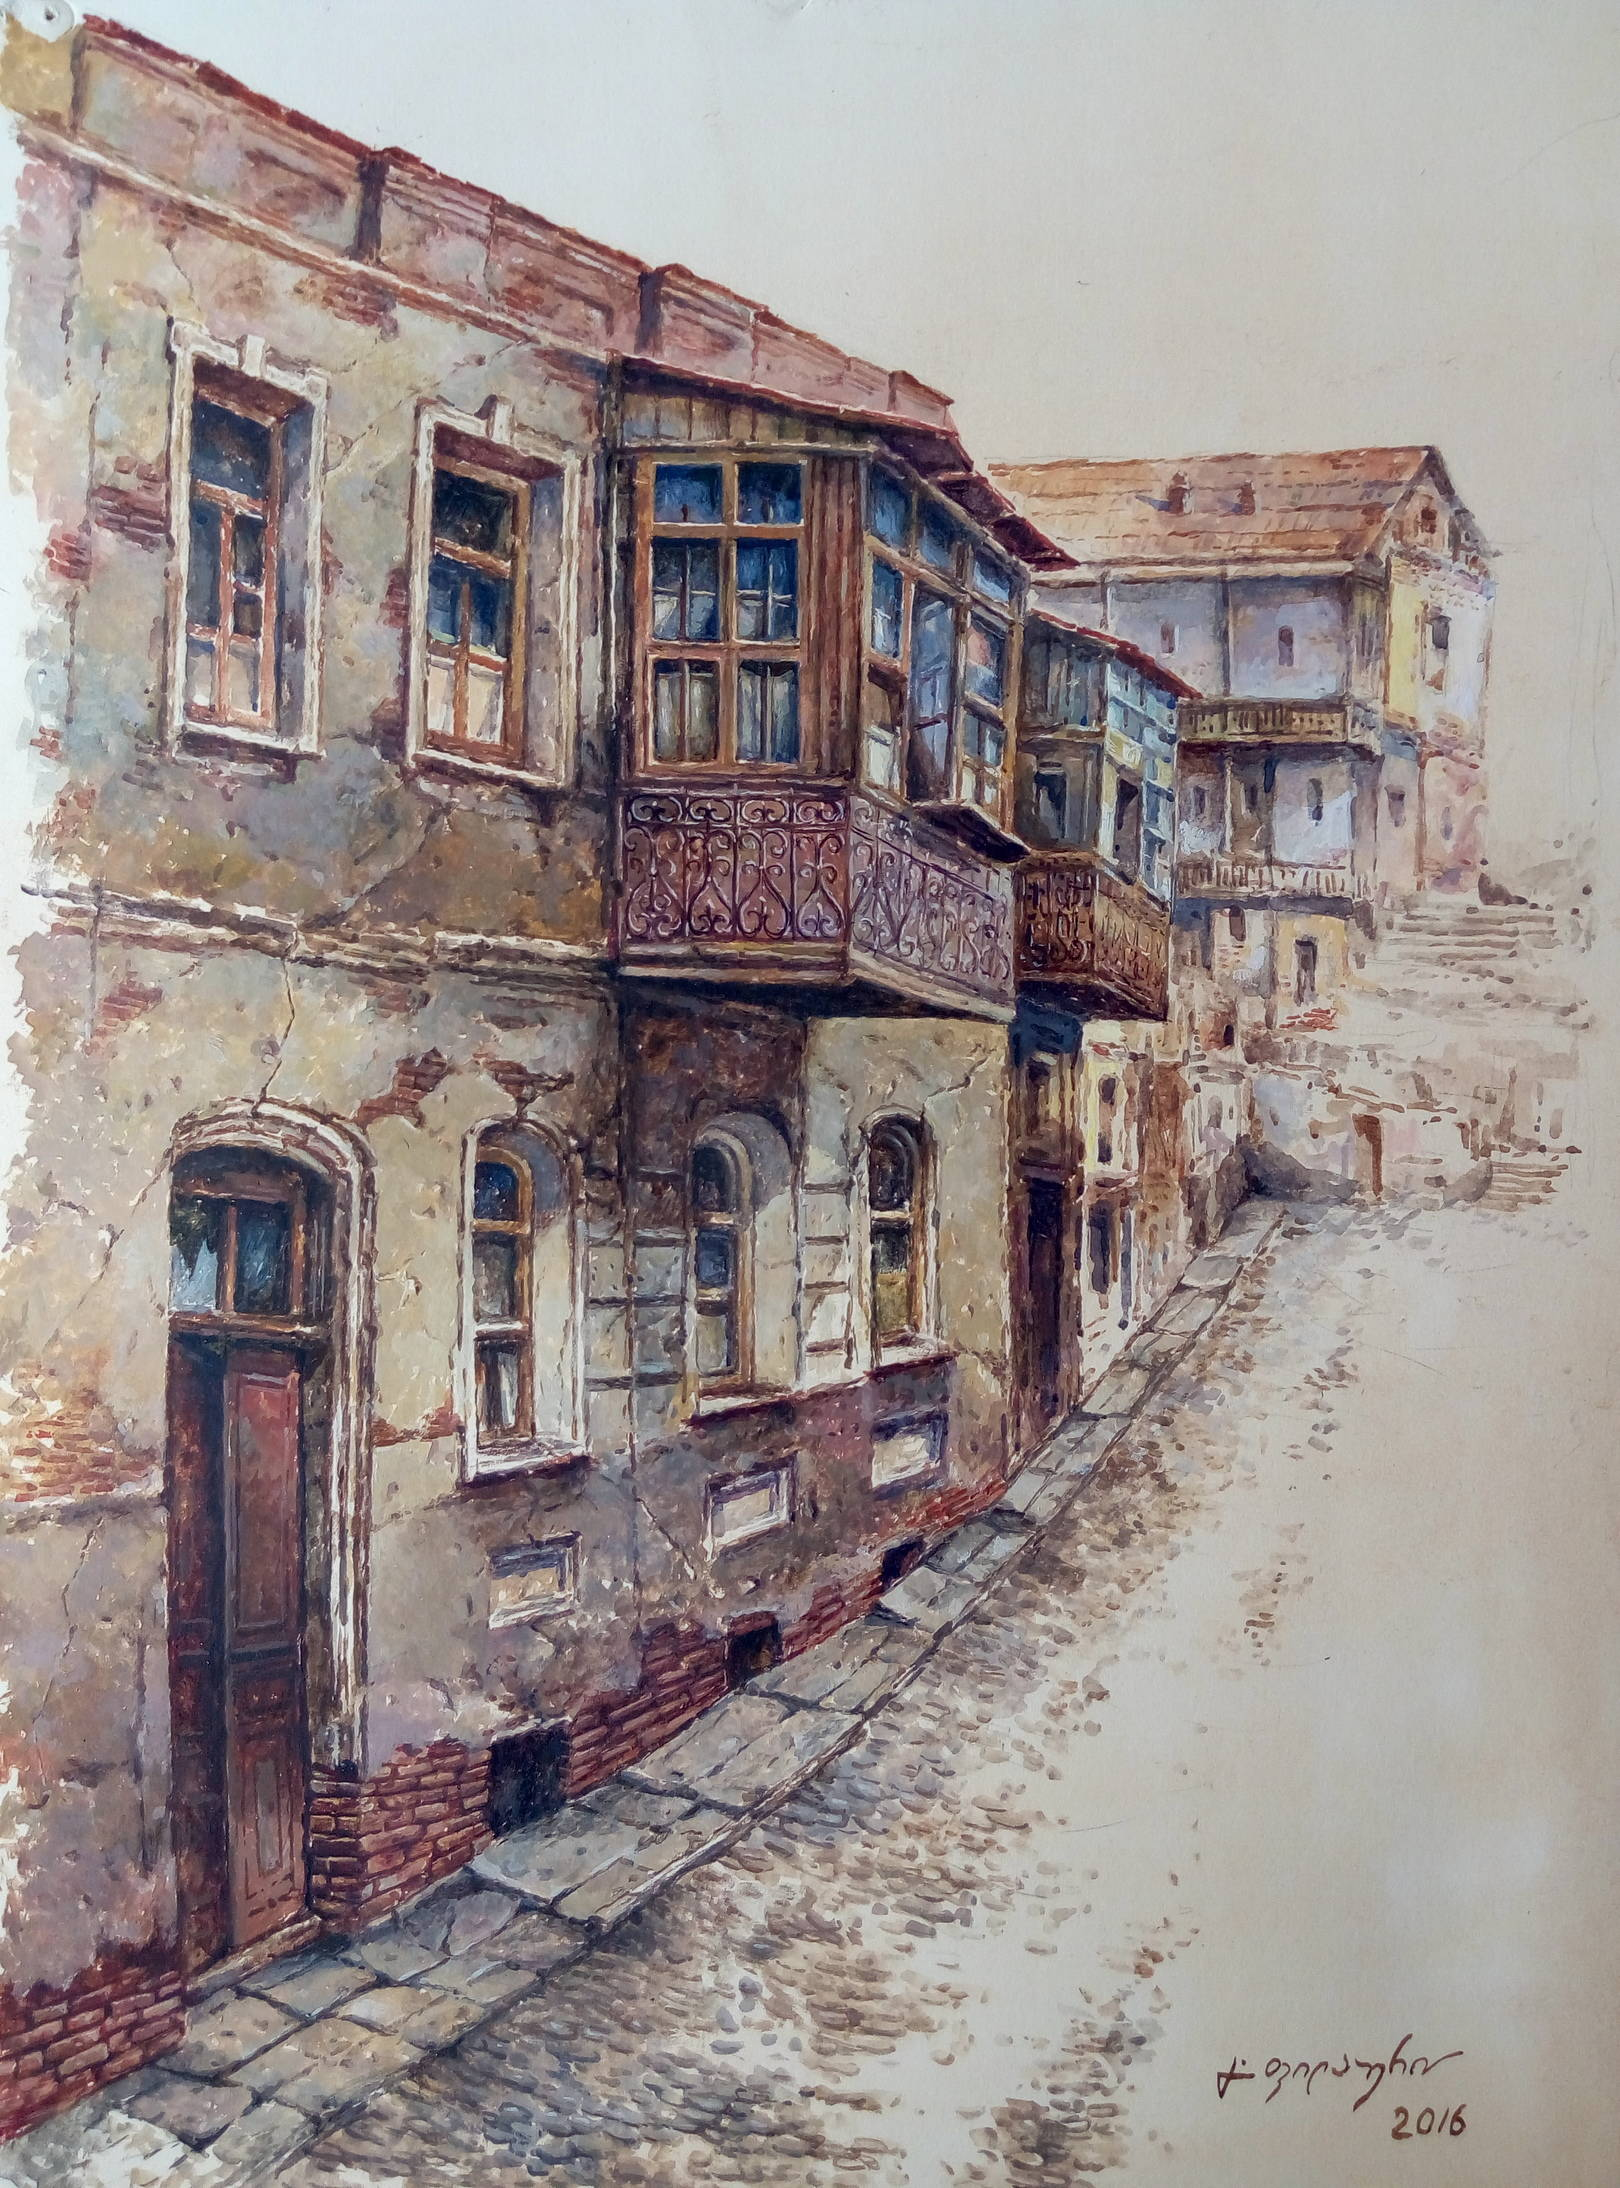 «Старый дом в Абанотубани»                бумага, акварель, гуашь «Old house in Abanotubani»                     paper, aquarelle, gouache 49x39, 2017